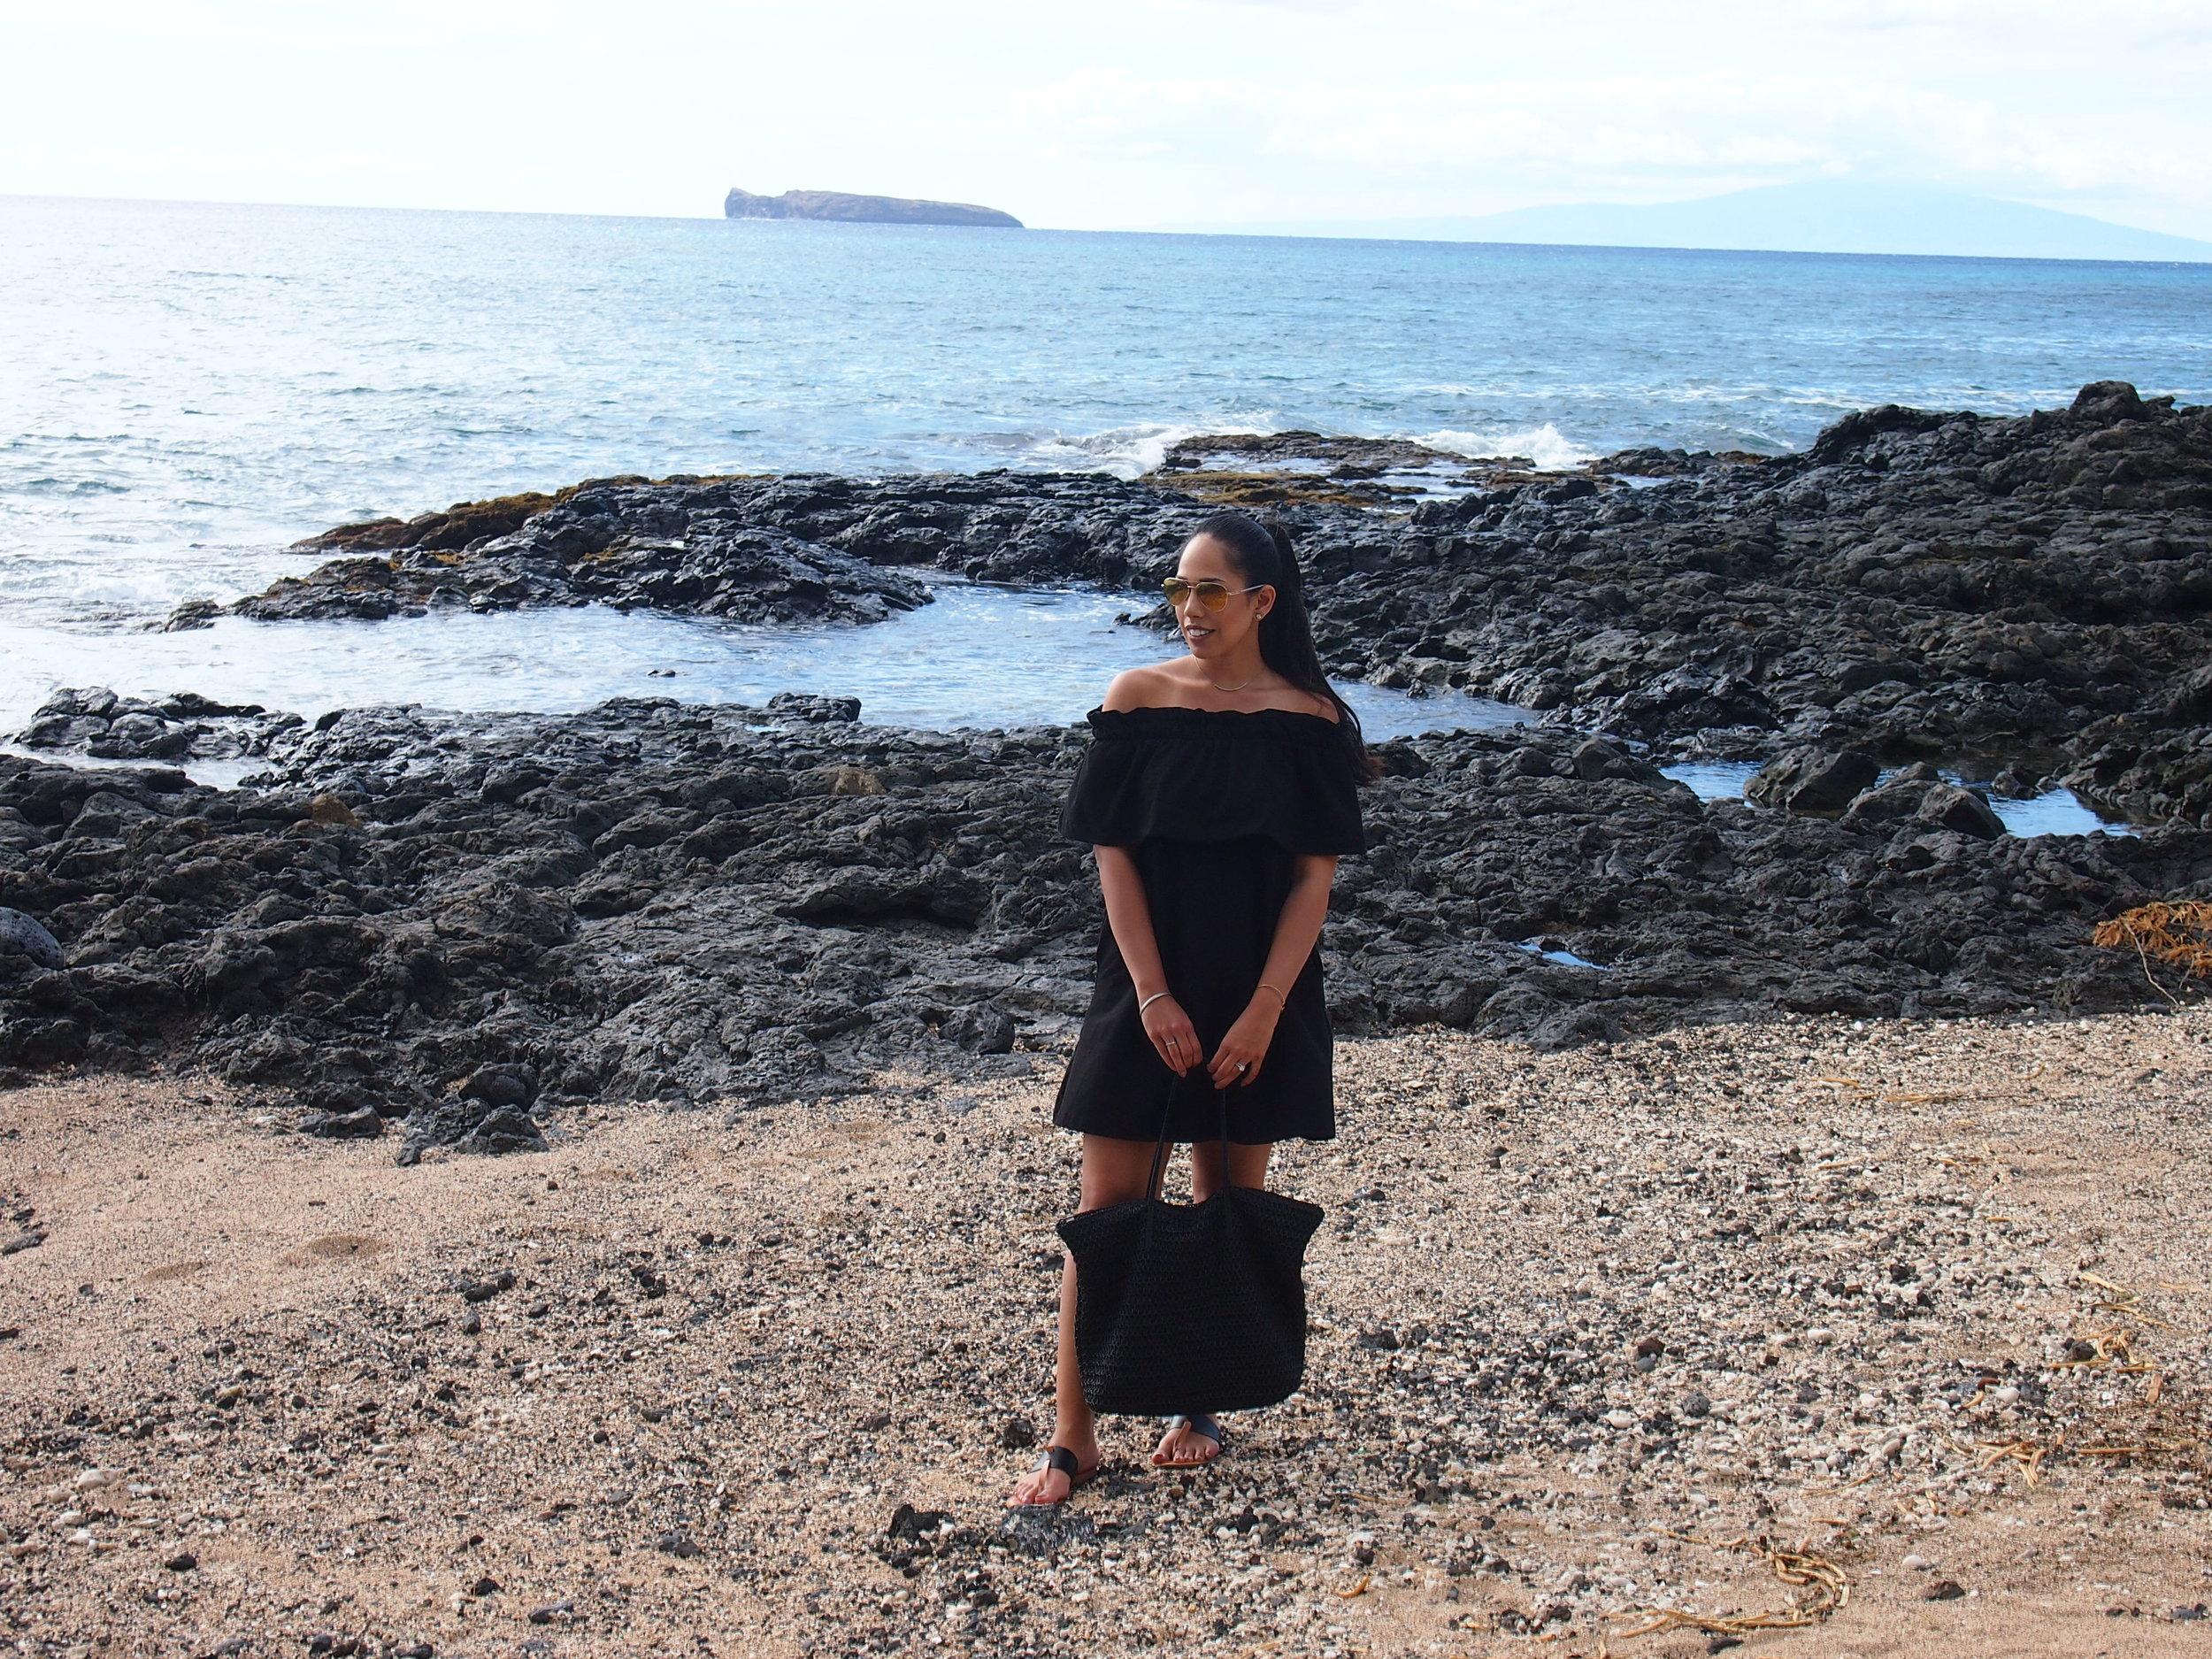 big-beach-maui-best-beaches-one-week-maui-vacation